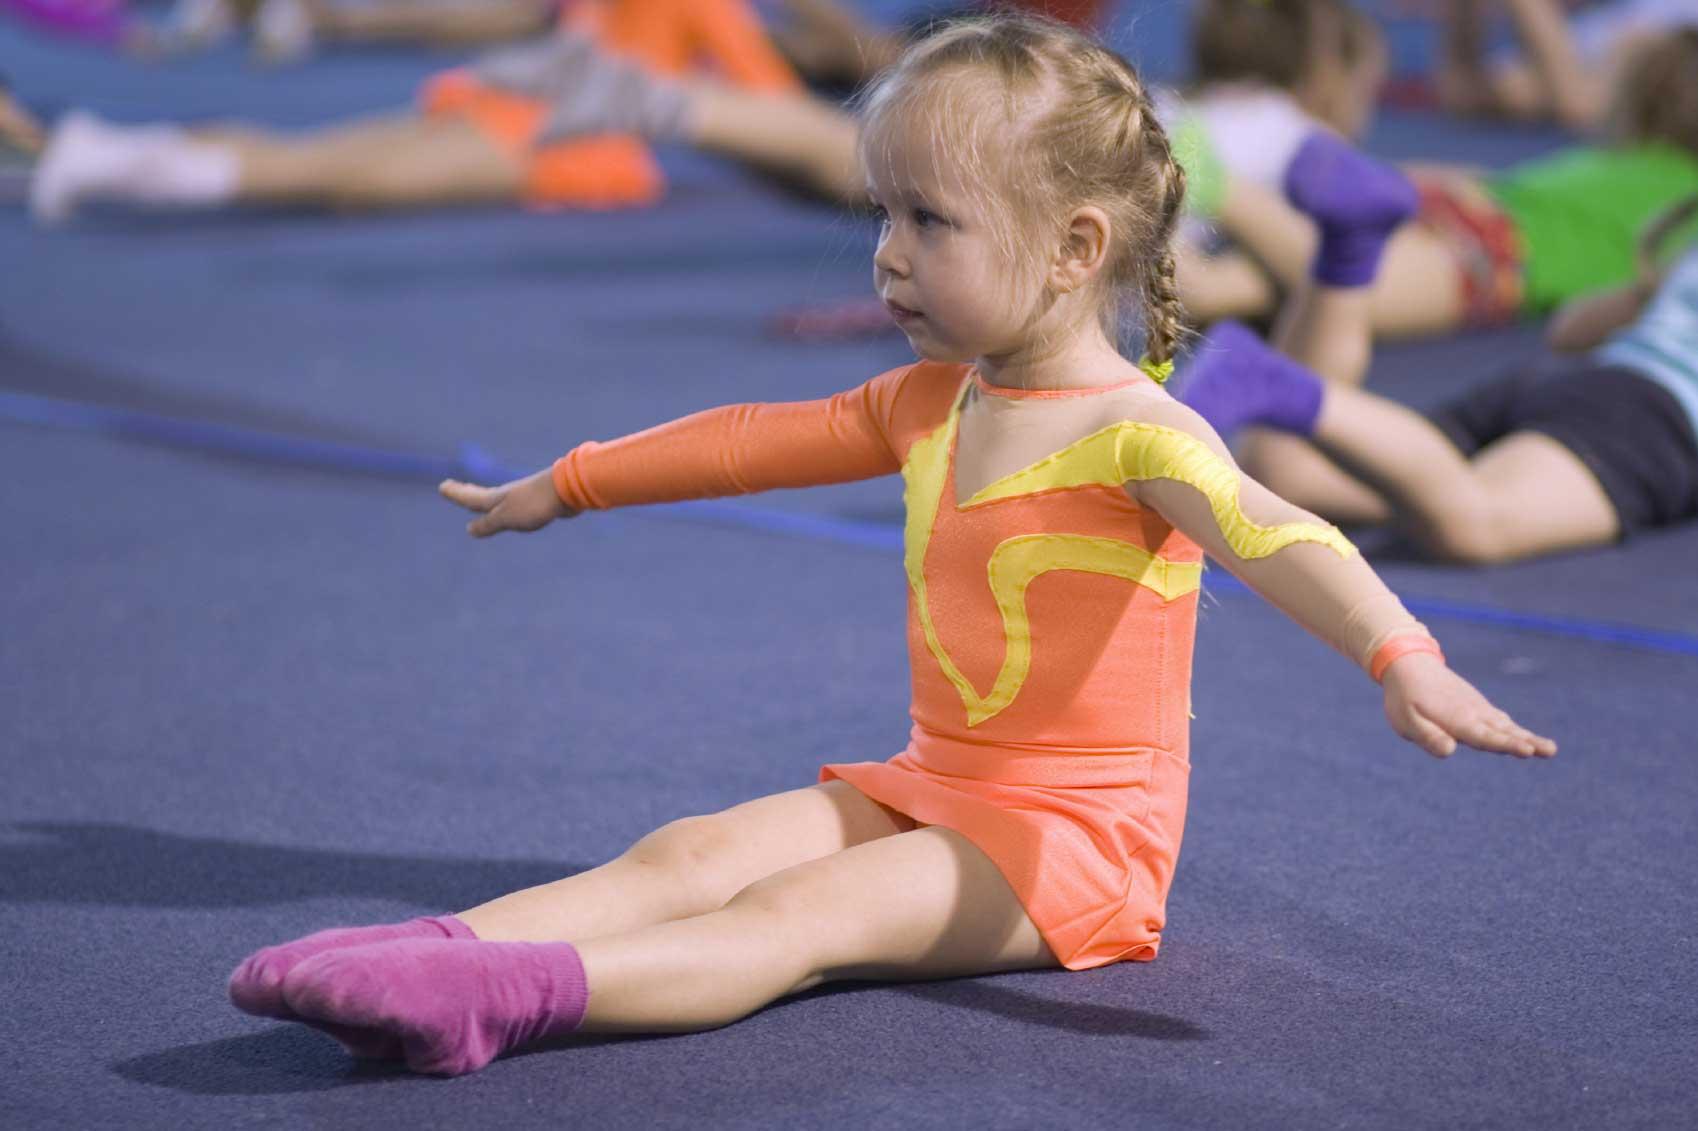 Гимнастика для ребенка 3 года фото